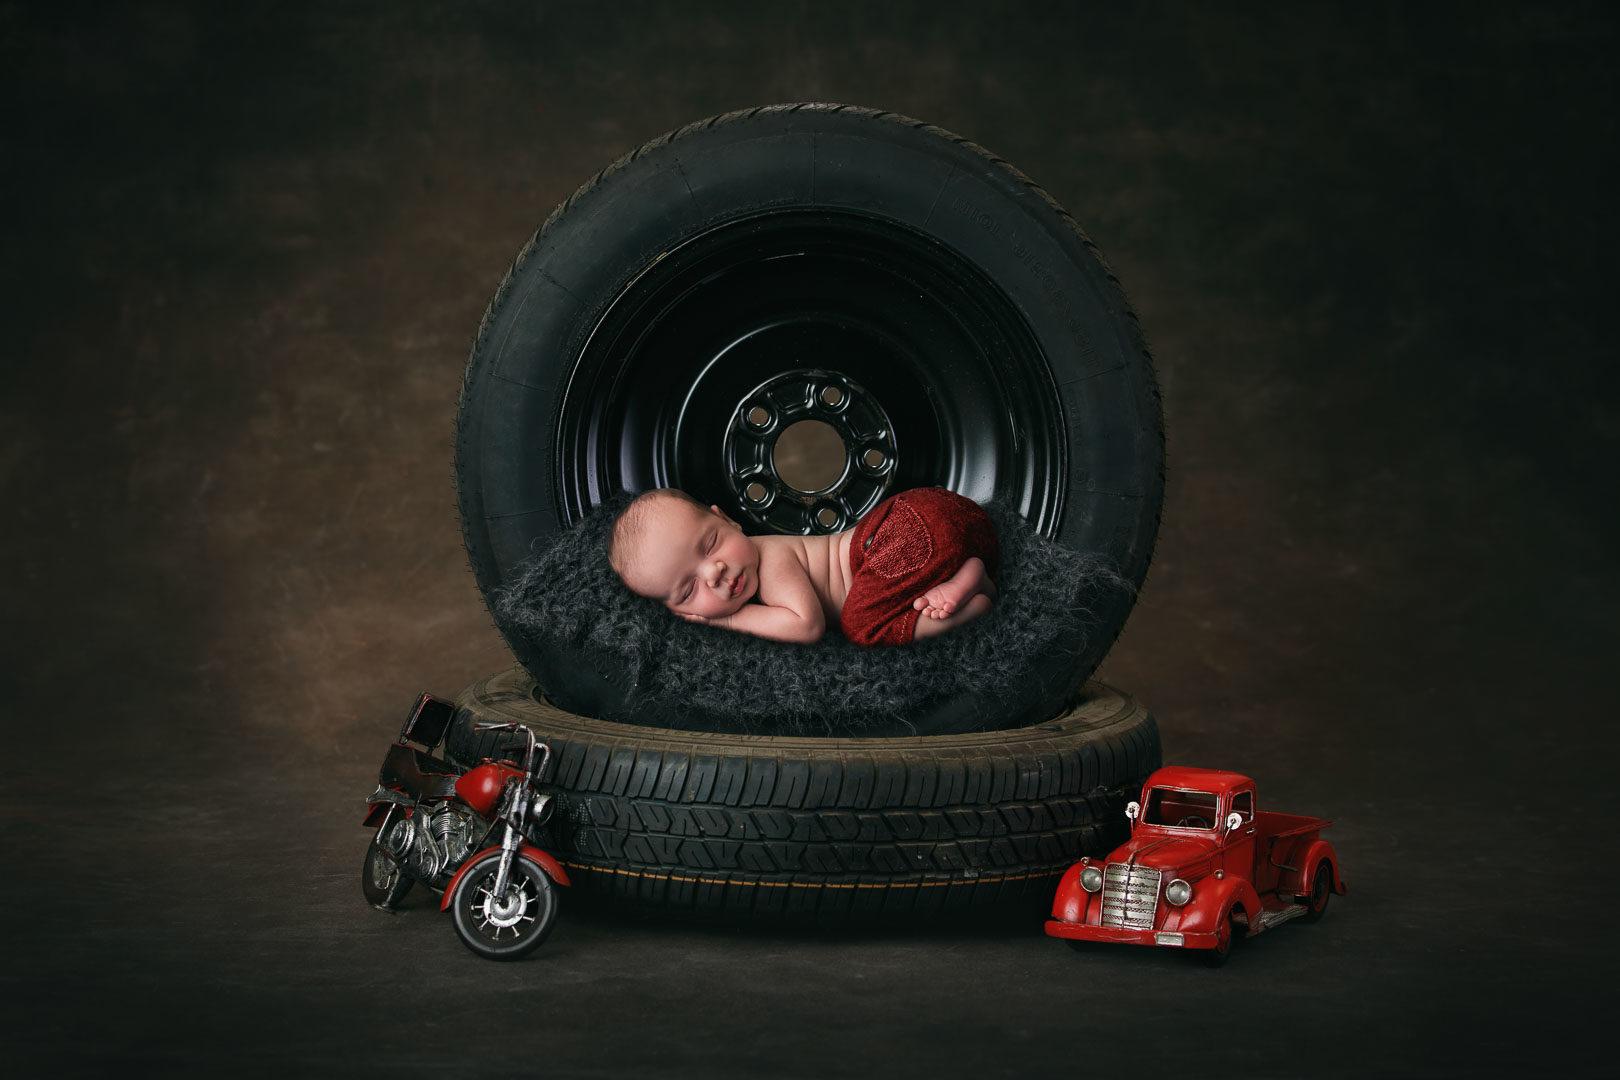 imagen-original-reportaje-bebe-recien-nacido-zaragoza-fotografo-roberto-montorio-alejandra-lacosta 11